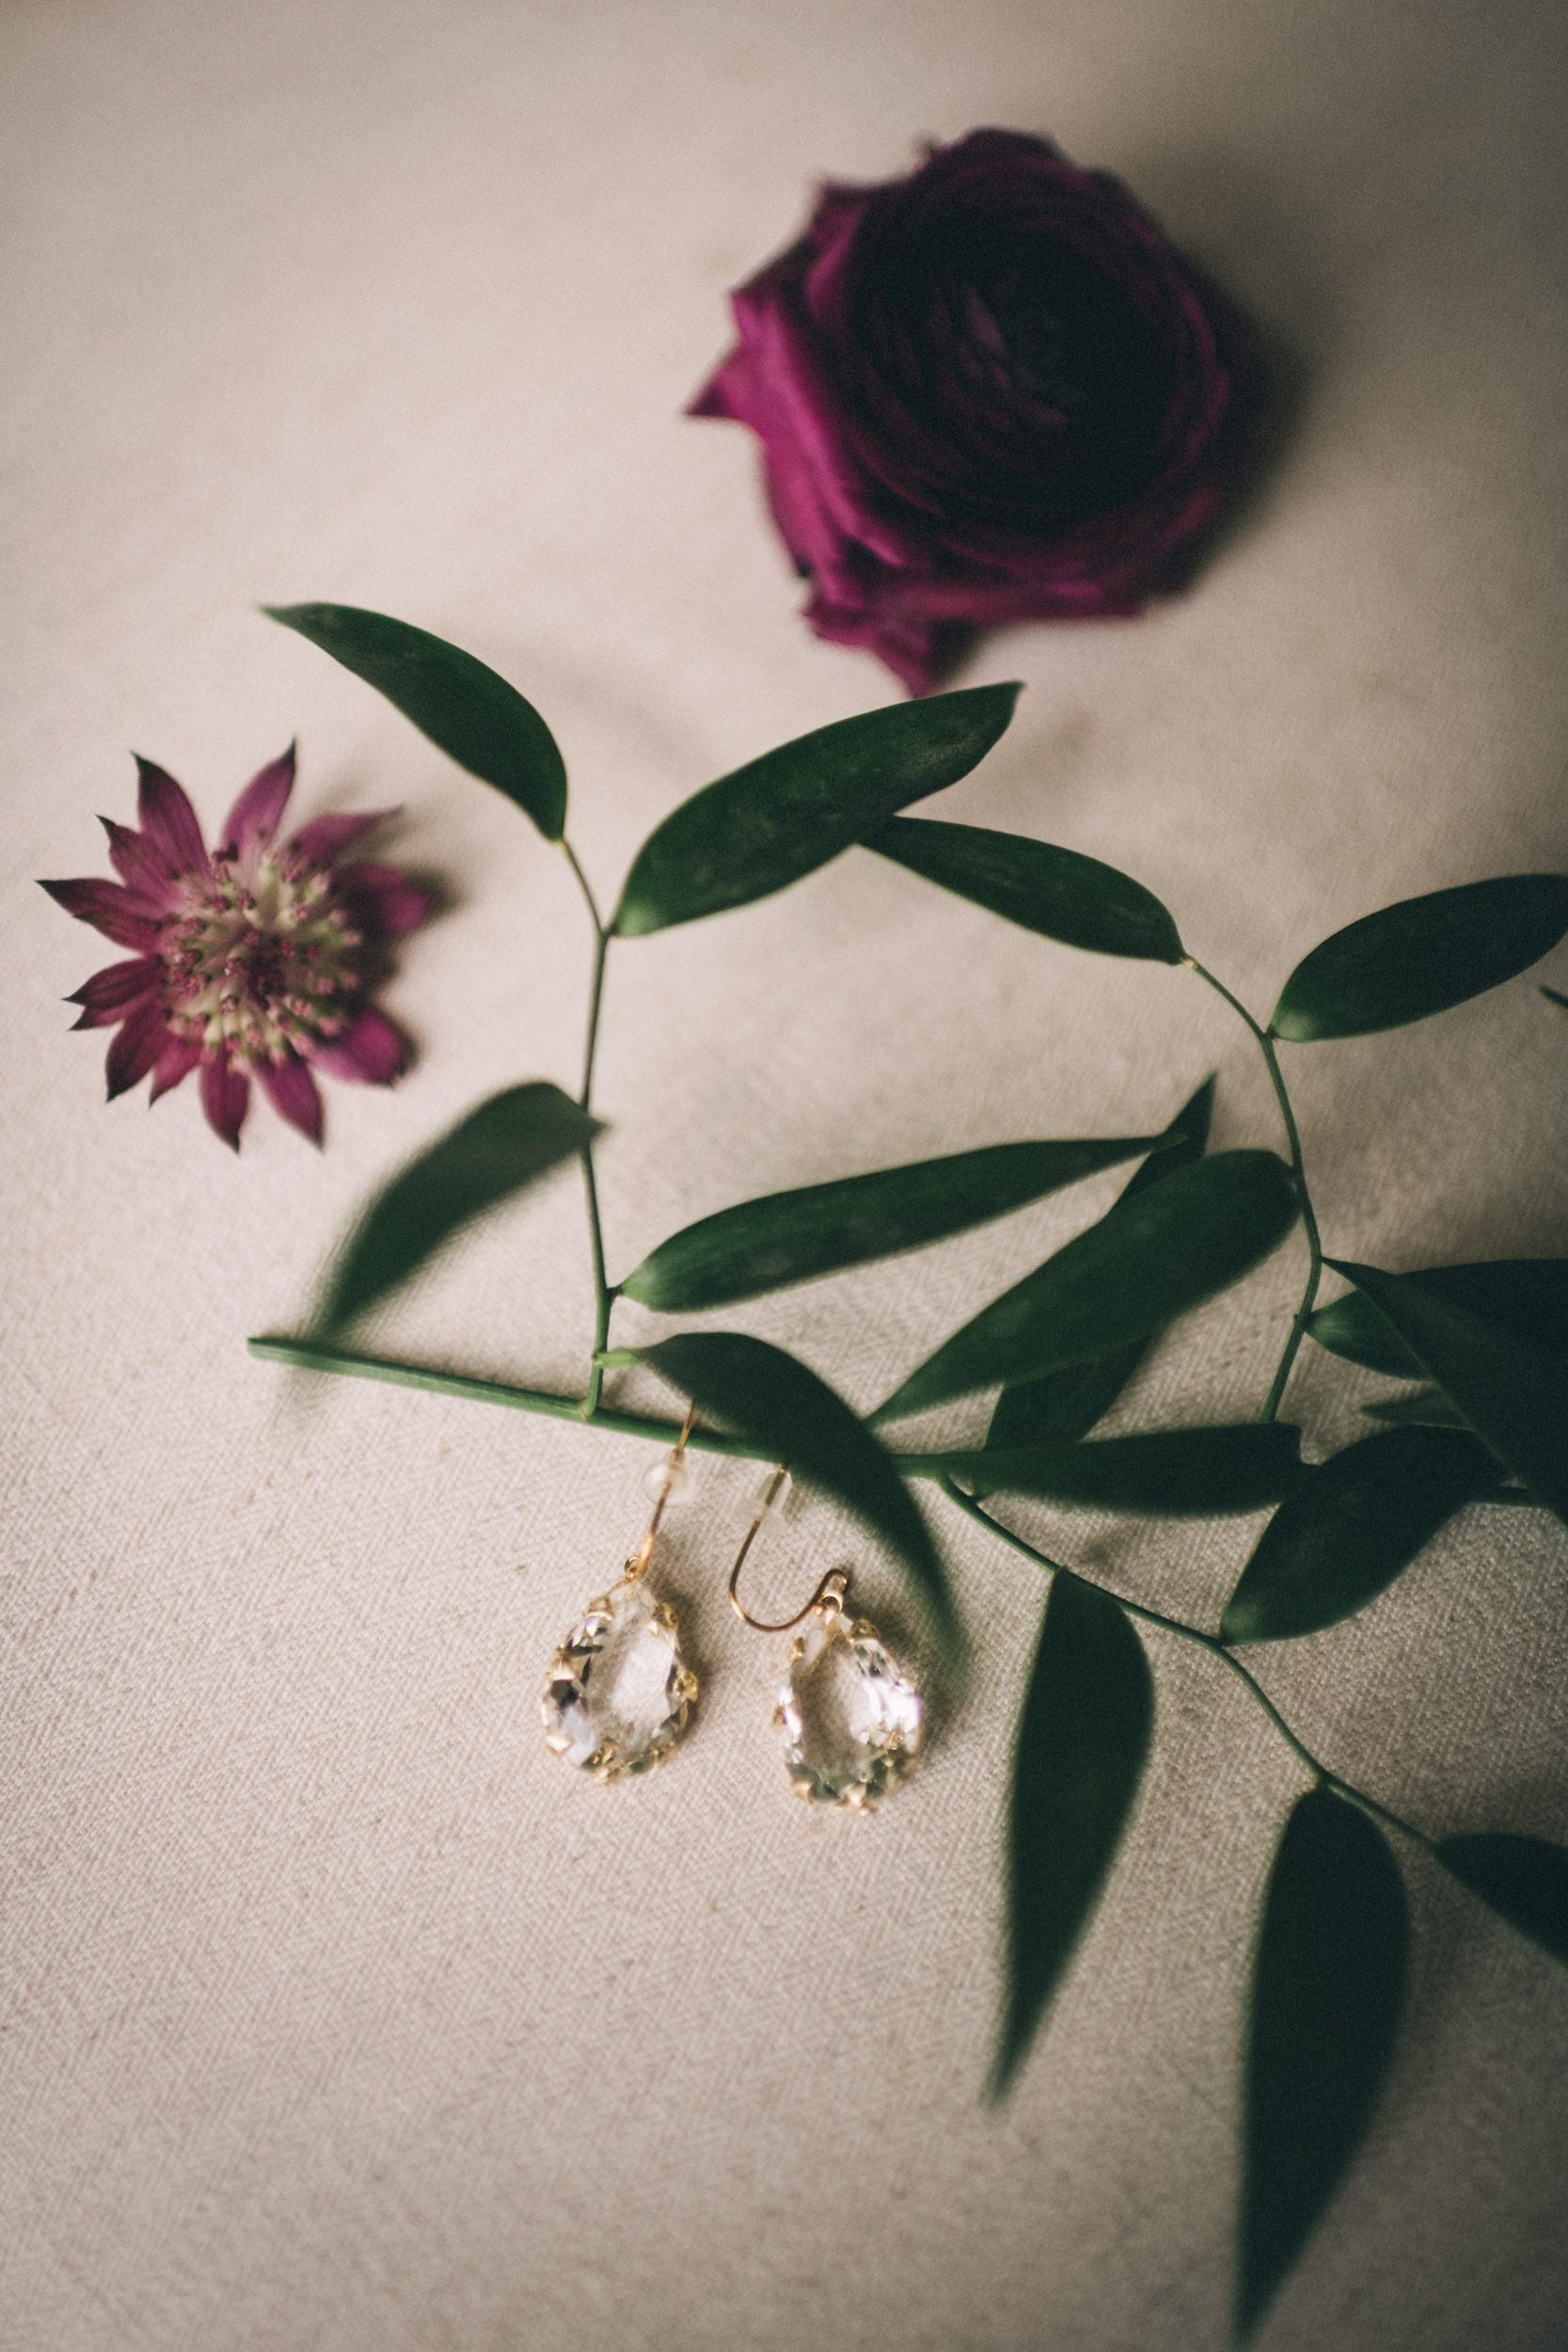 Louisville-Kentucky-Wedding-and-Elopement-Photographer-Sarah-Katherine-Davis-Photography-Summer-Jewel-Toned-Wedding-Chineese-Tea-Ceremony-Warrenwood-Manor-Danville-16.jpg